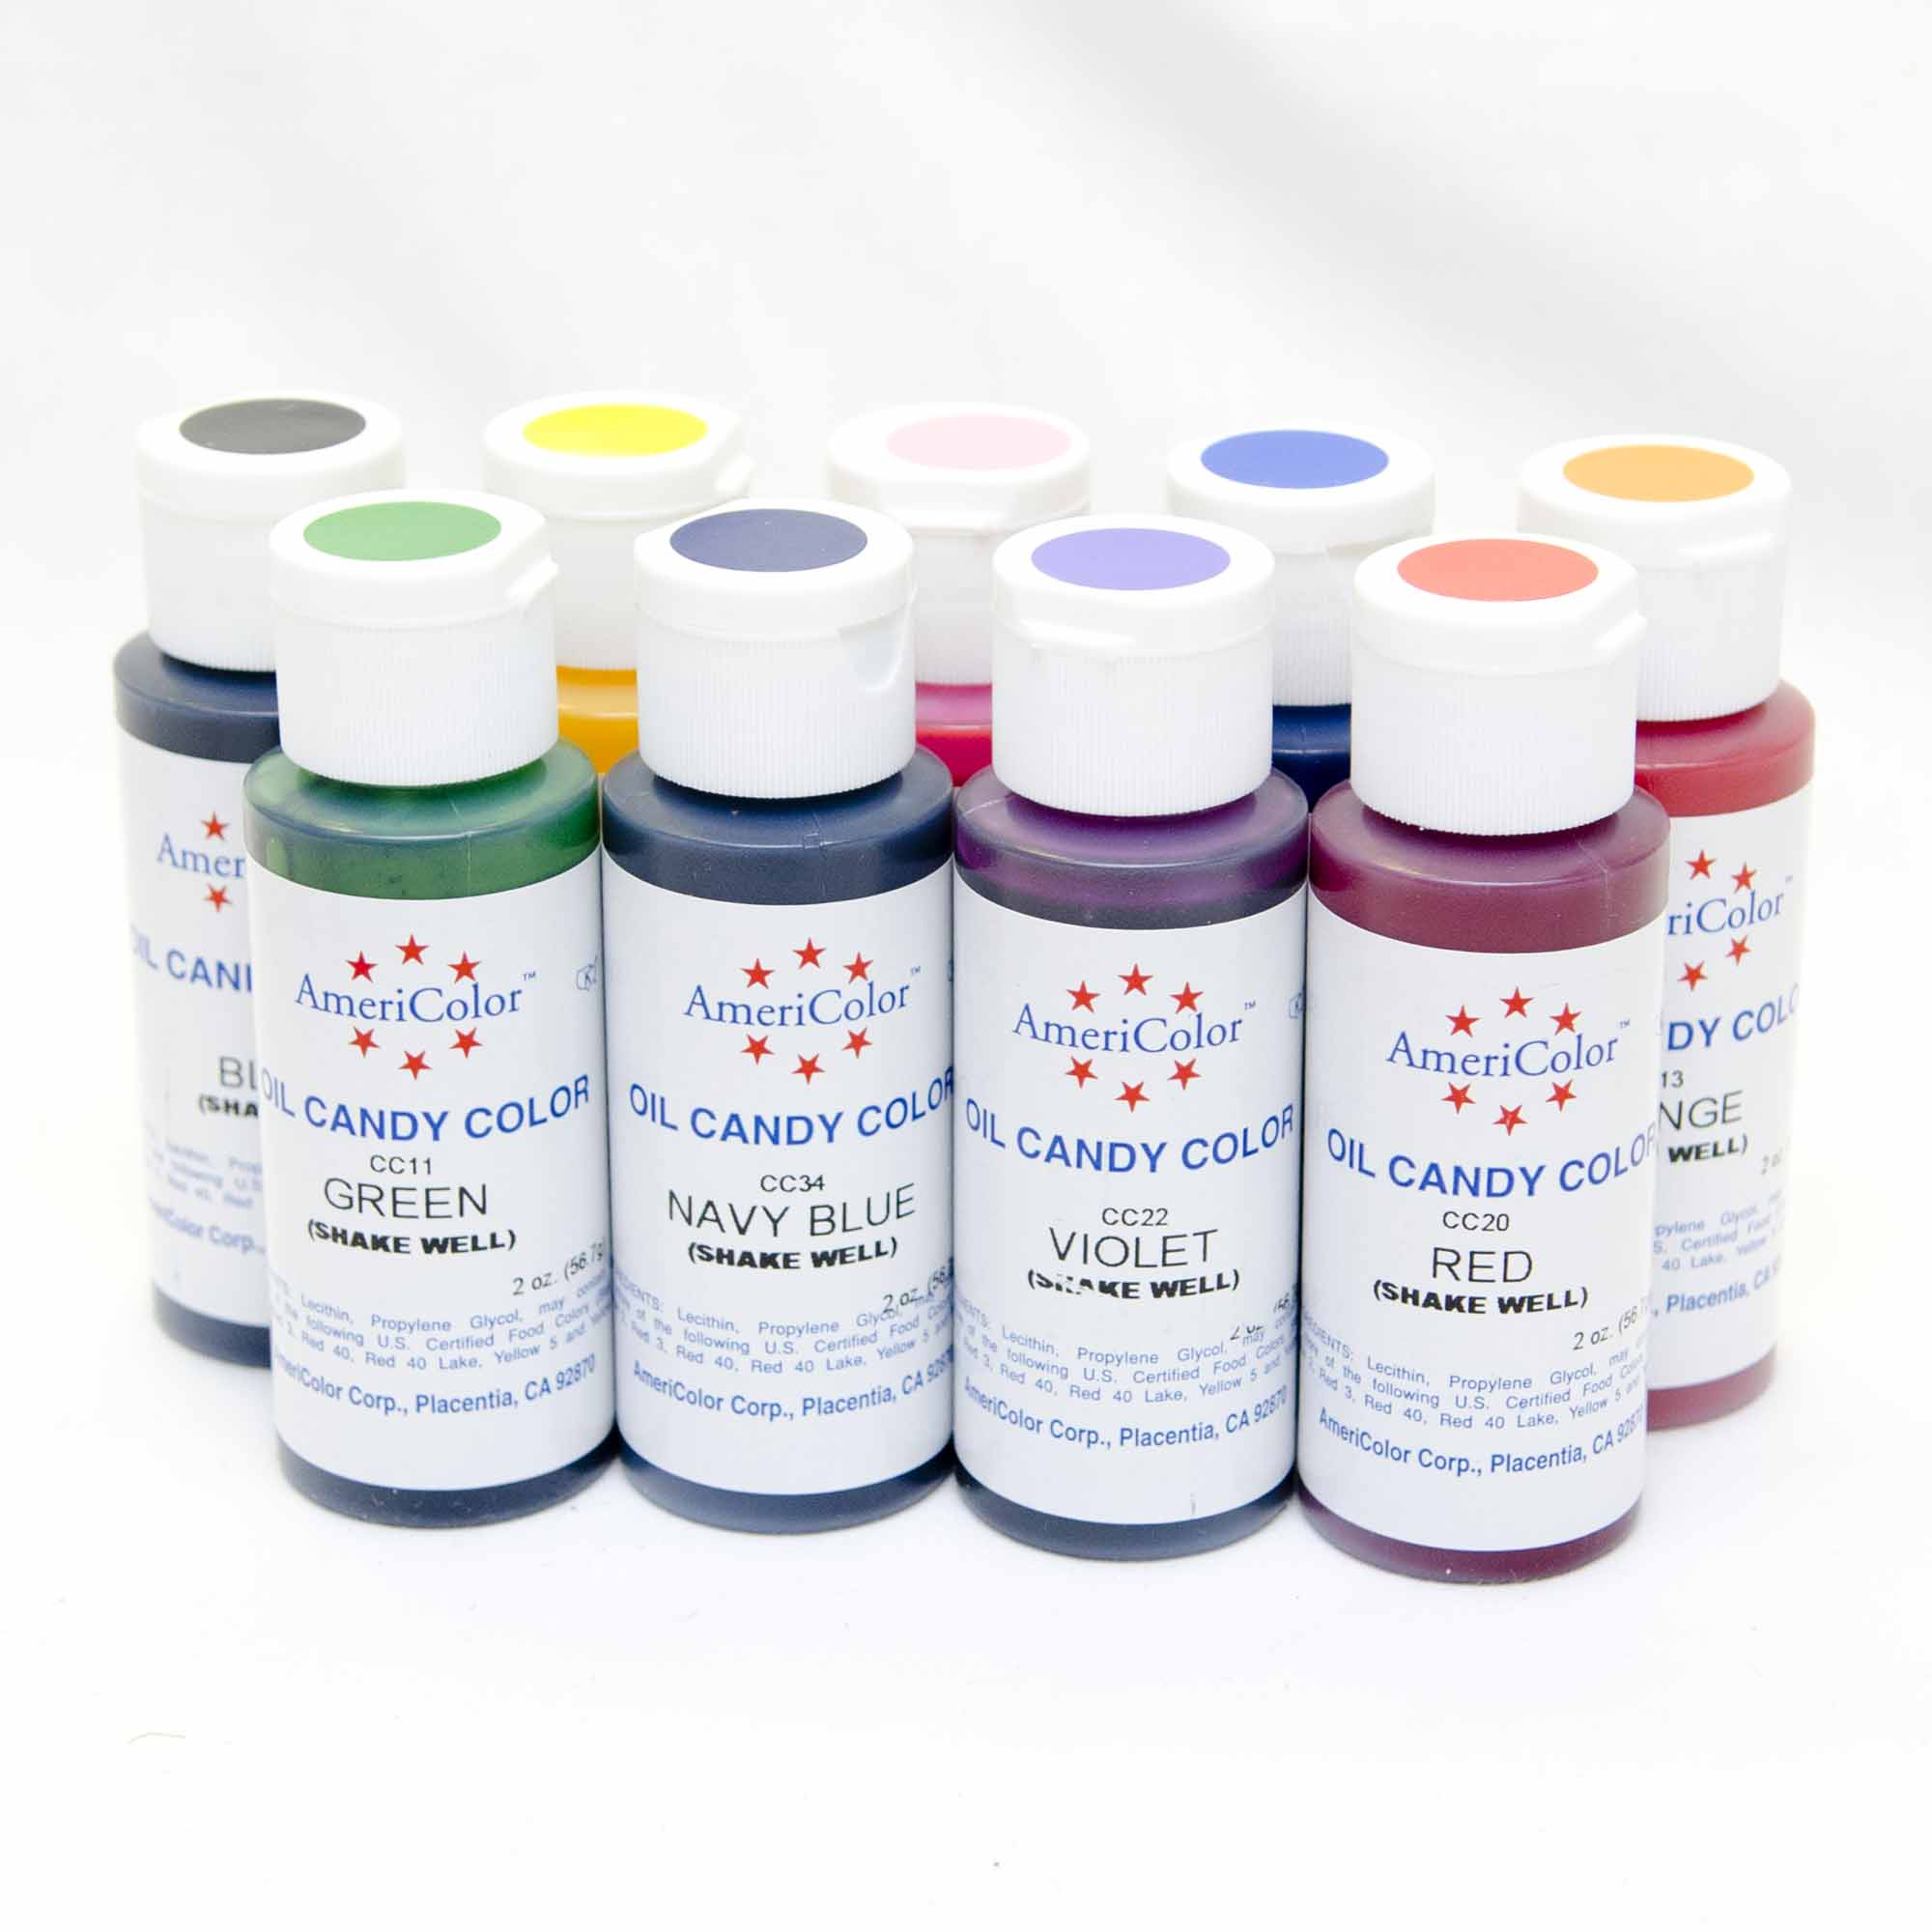 Americolor Oil Based Candy Color – 2 oz (choose color) | Cake ...